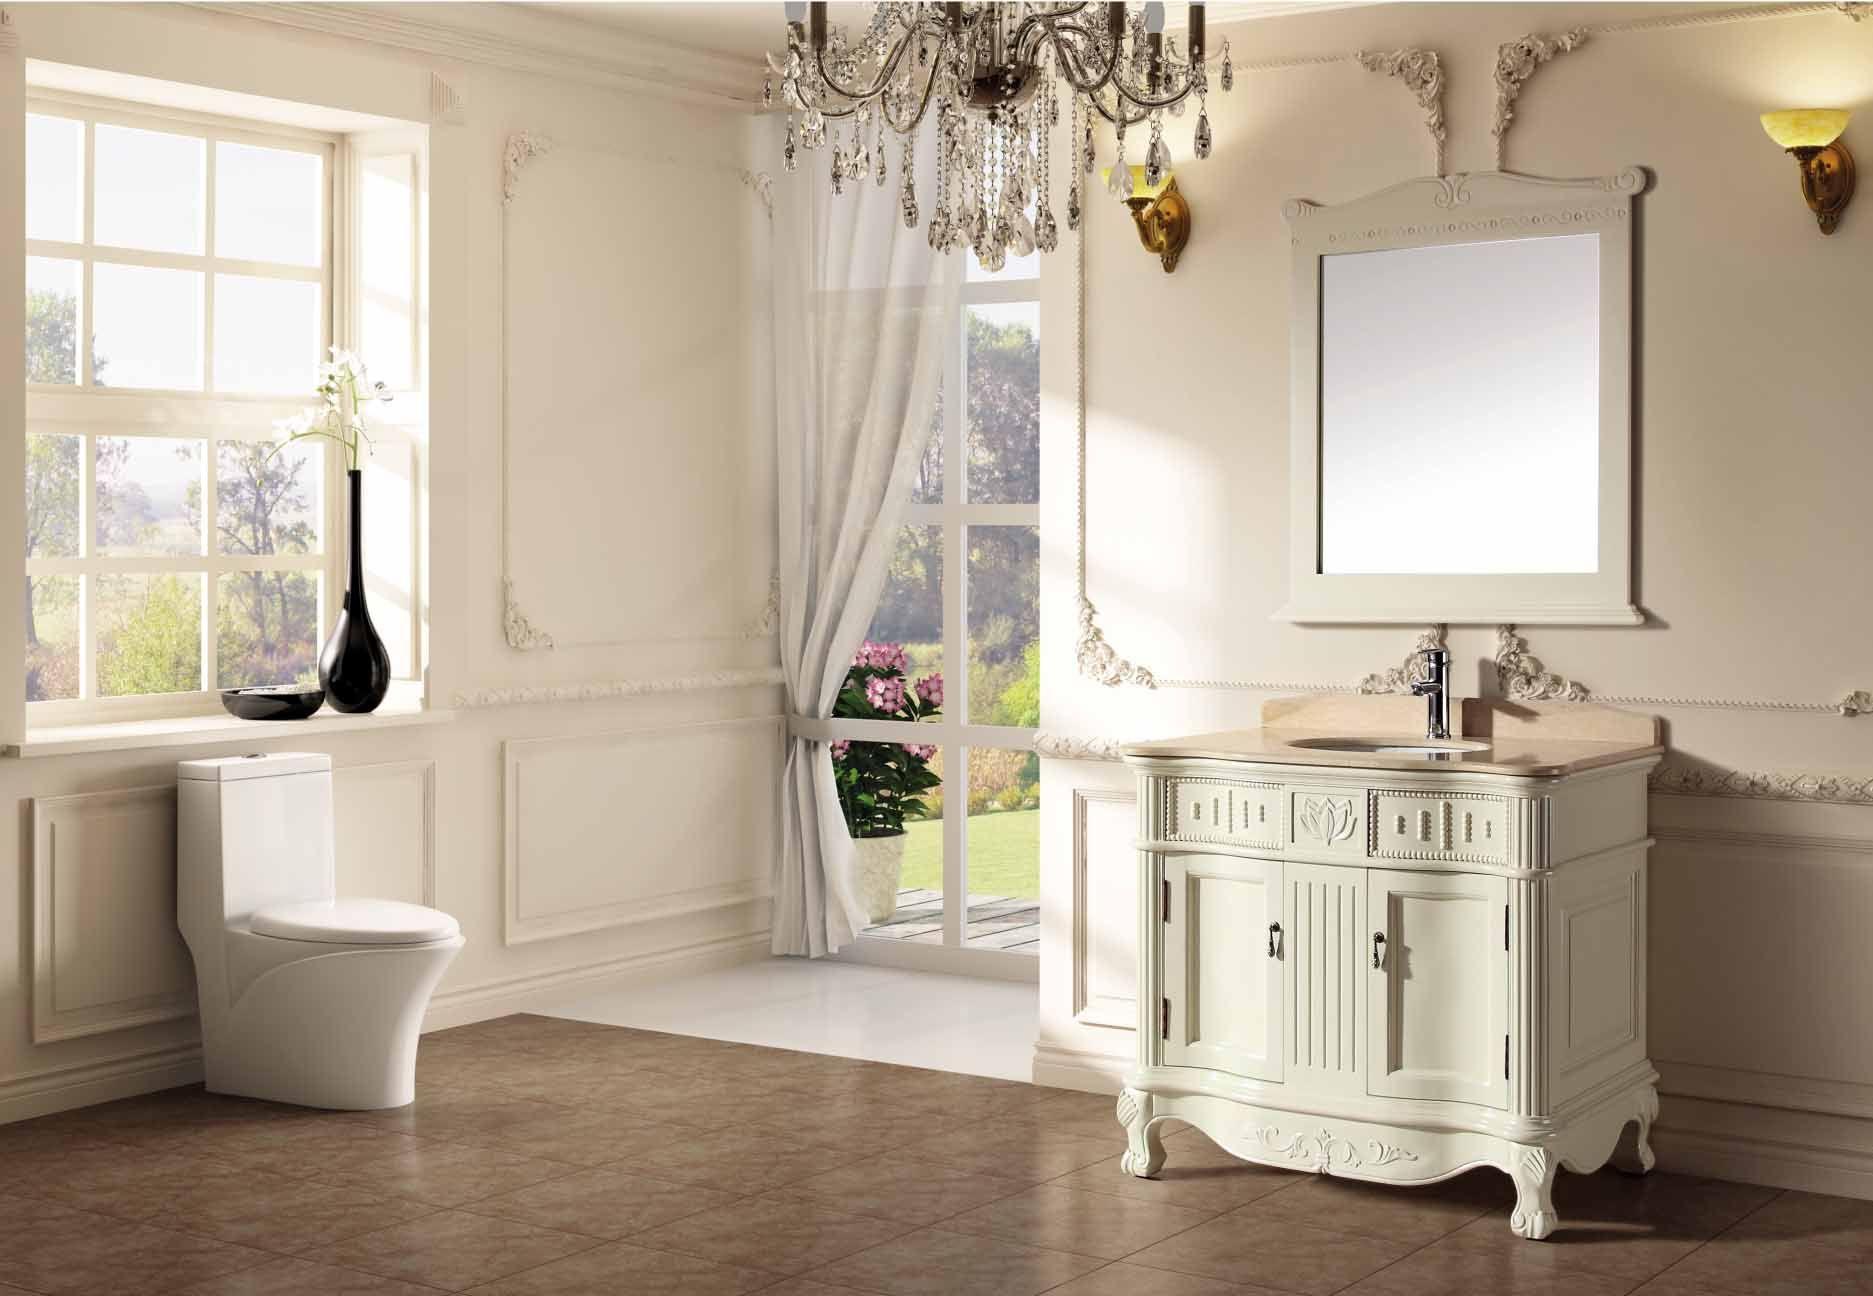 Merillat Bathroom Cabinets - Bathroom Modern Contemporary Home ...